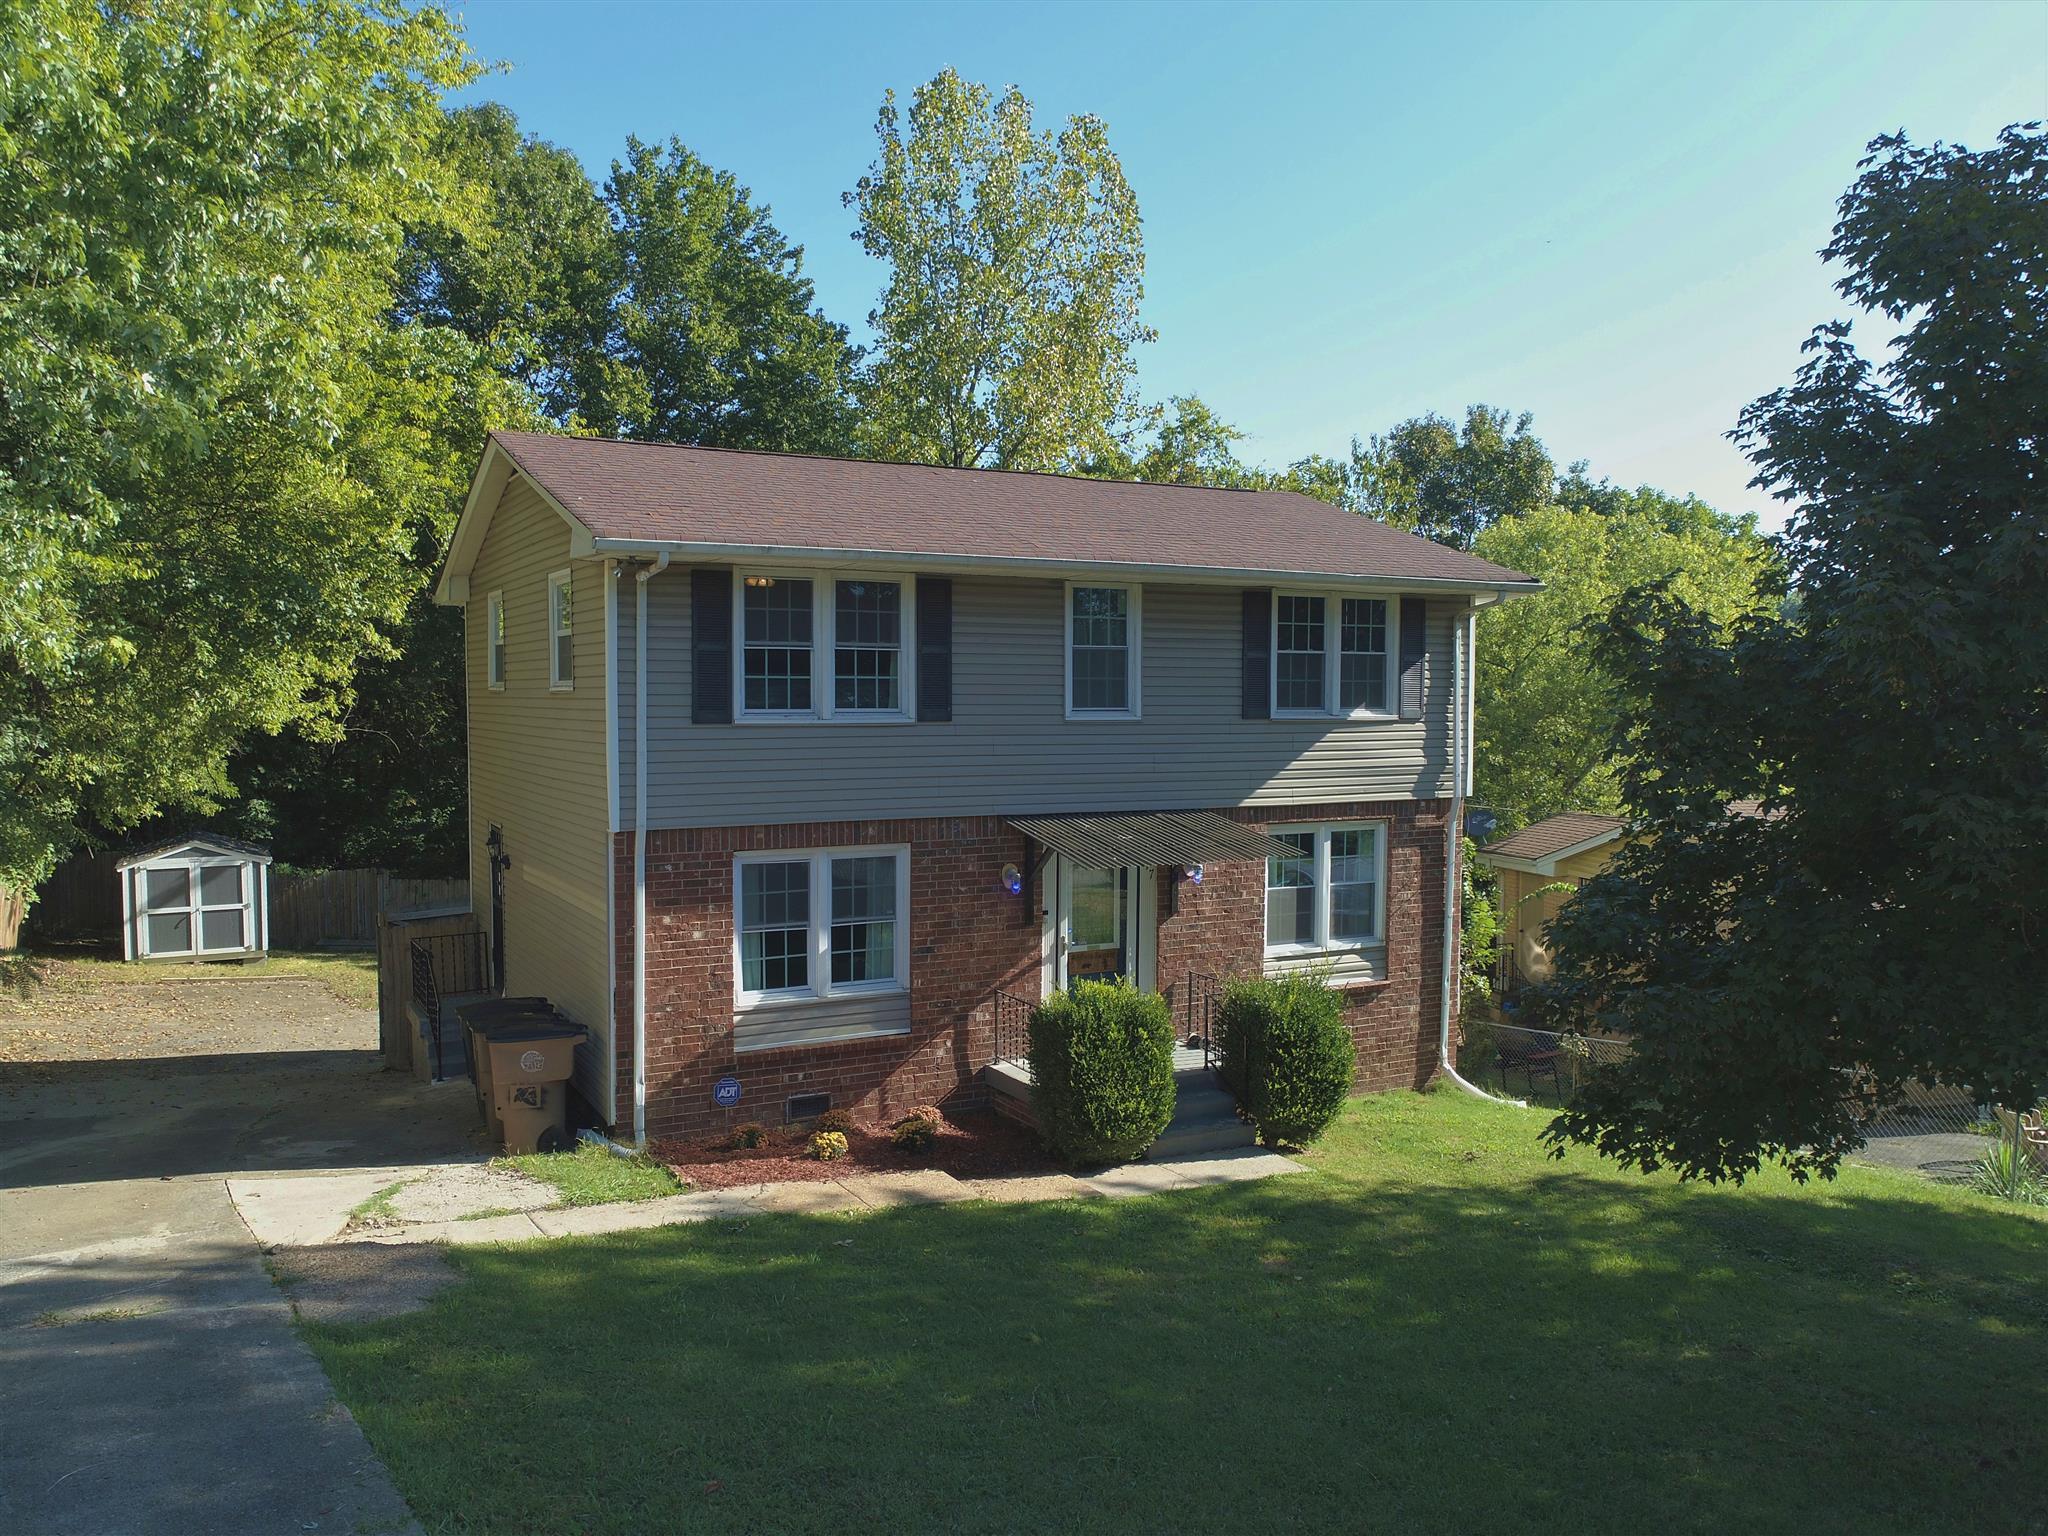 617 Maclaurin Ct, Nashville, TN 37207 - Nashville, TN real estate listing